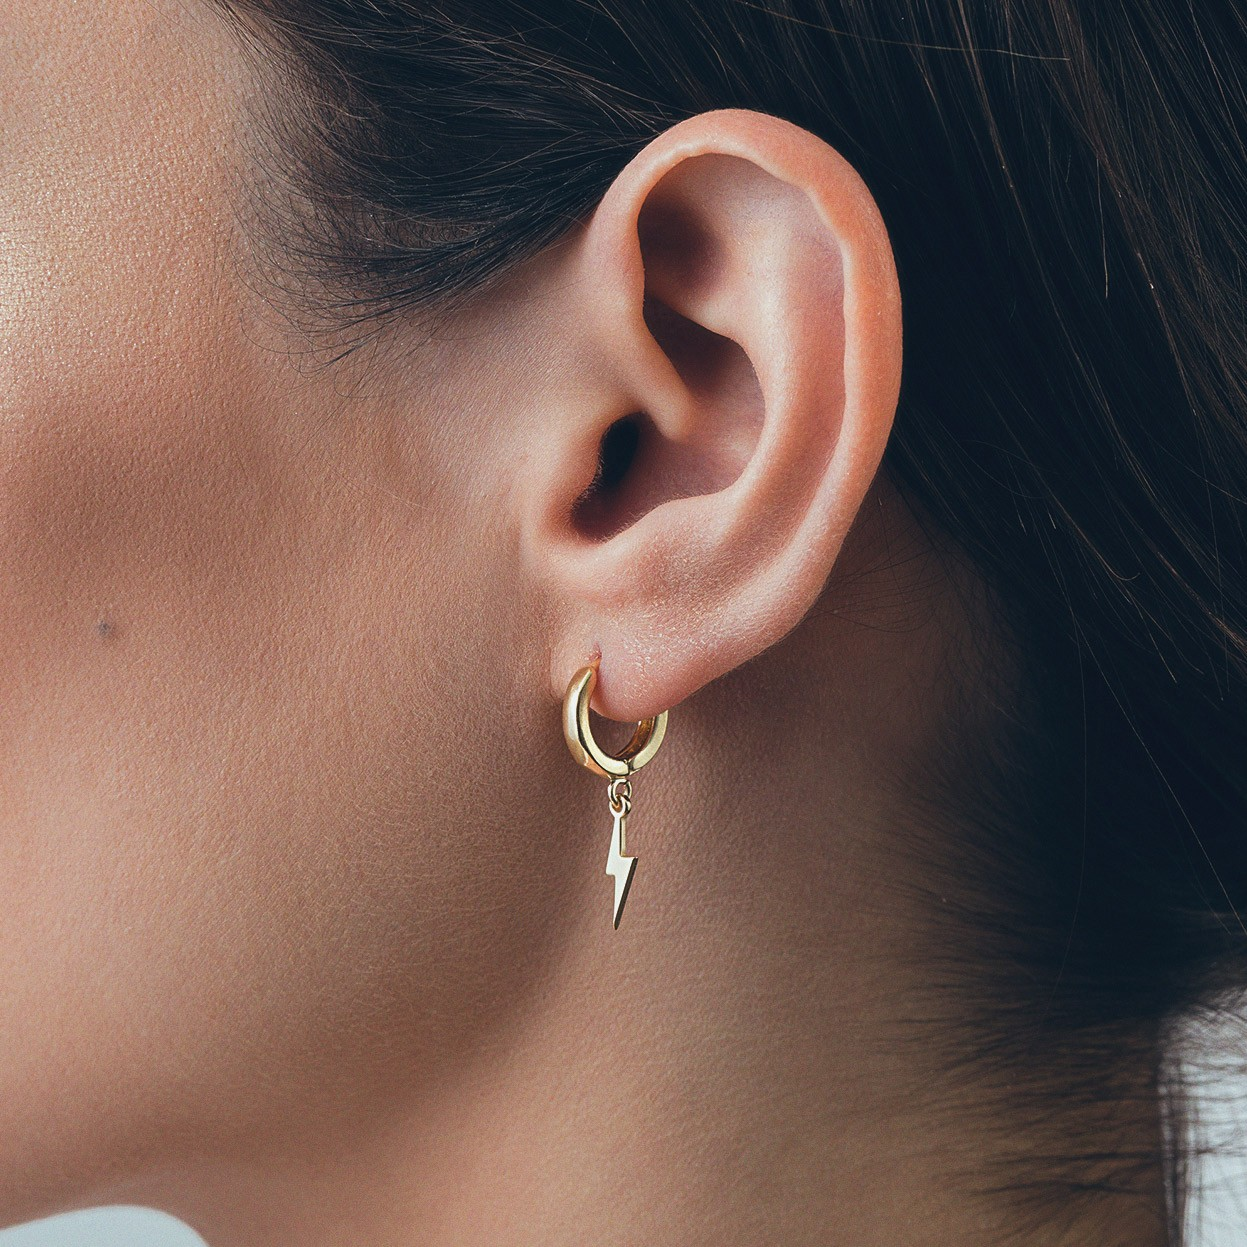 Seastar earrings sterling silver 925